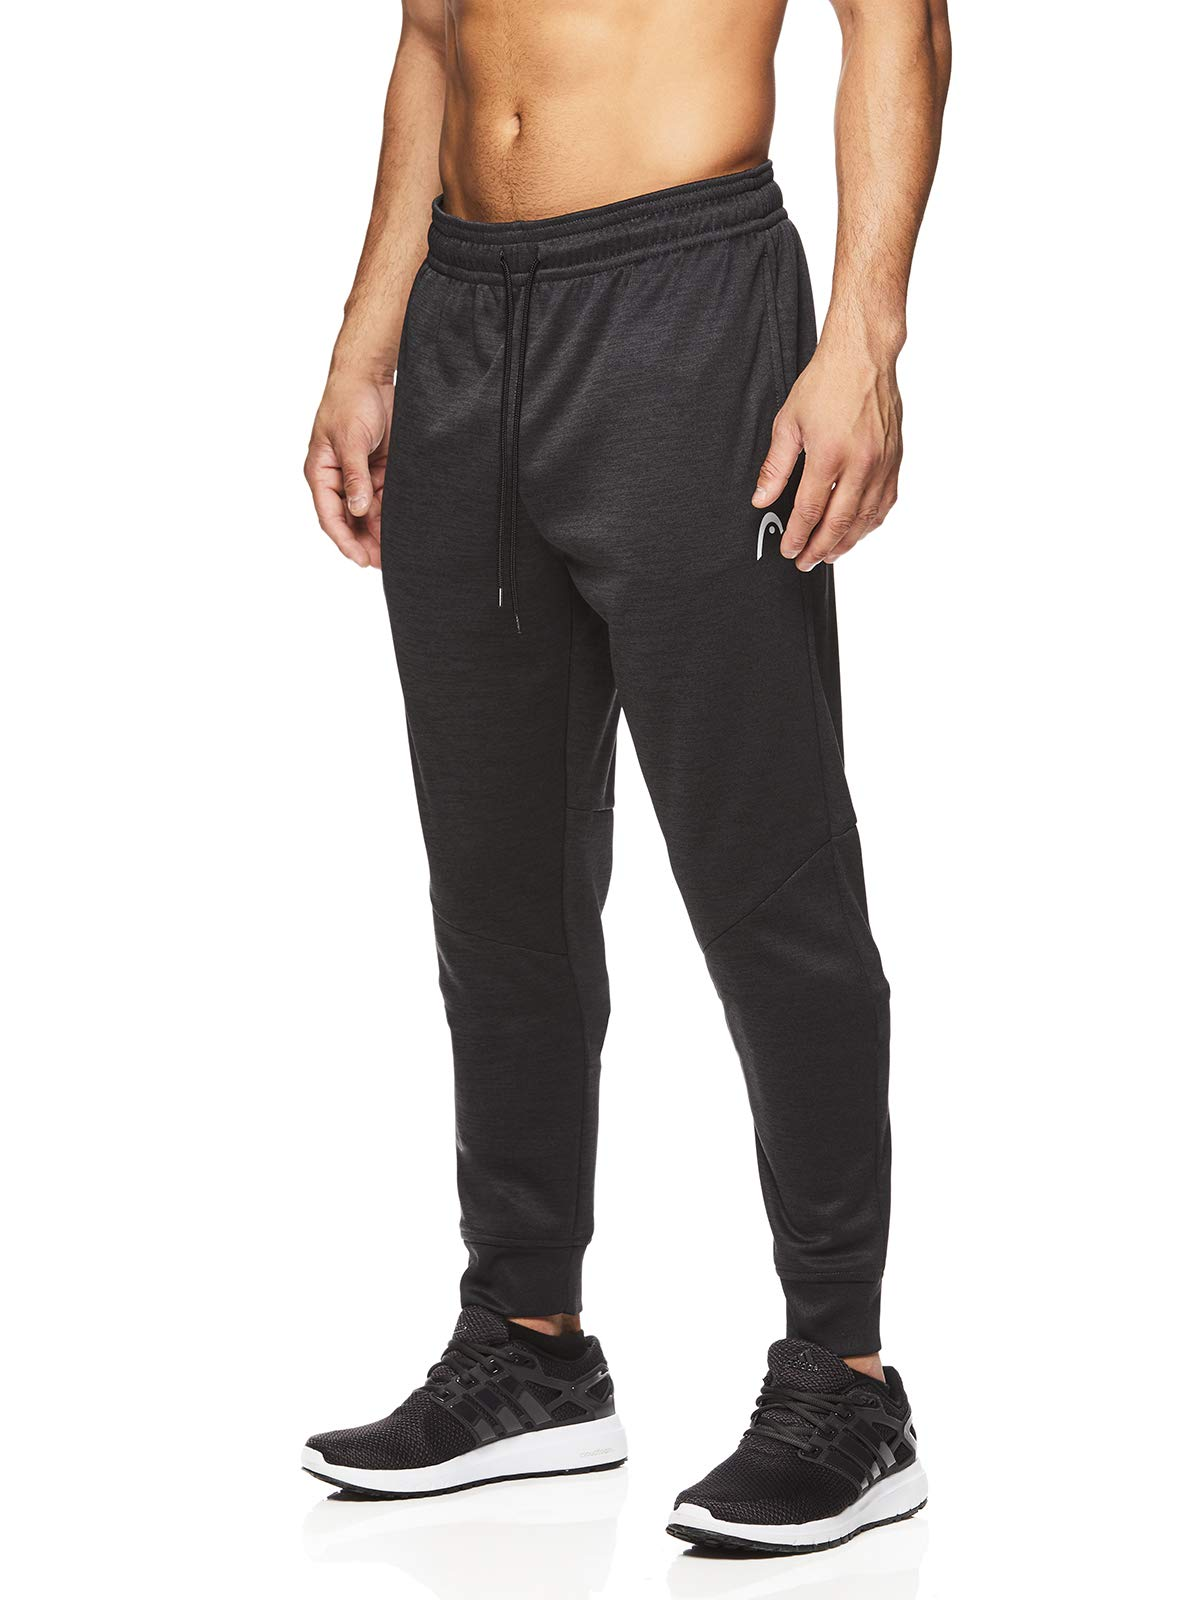 HEAD Men's Jogger Activewear Pants - Performance Workout & Running Sweatpants - Pro Black Heather, Small